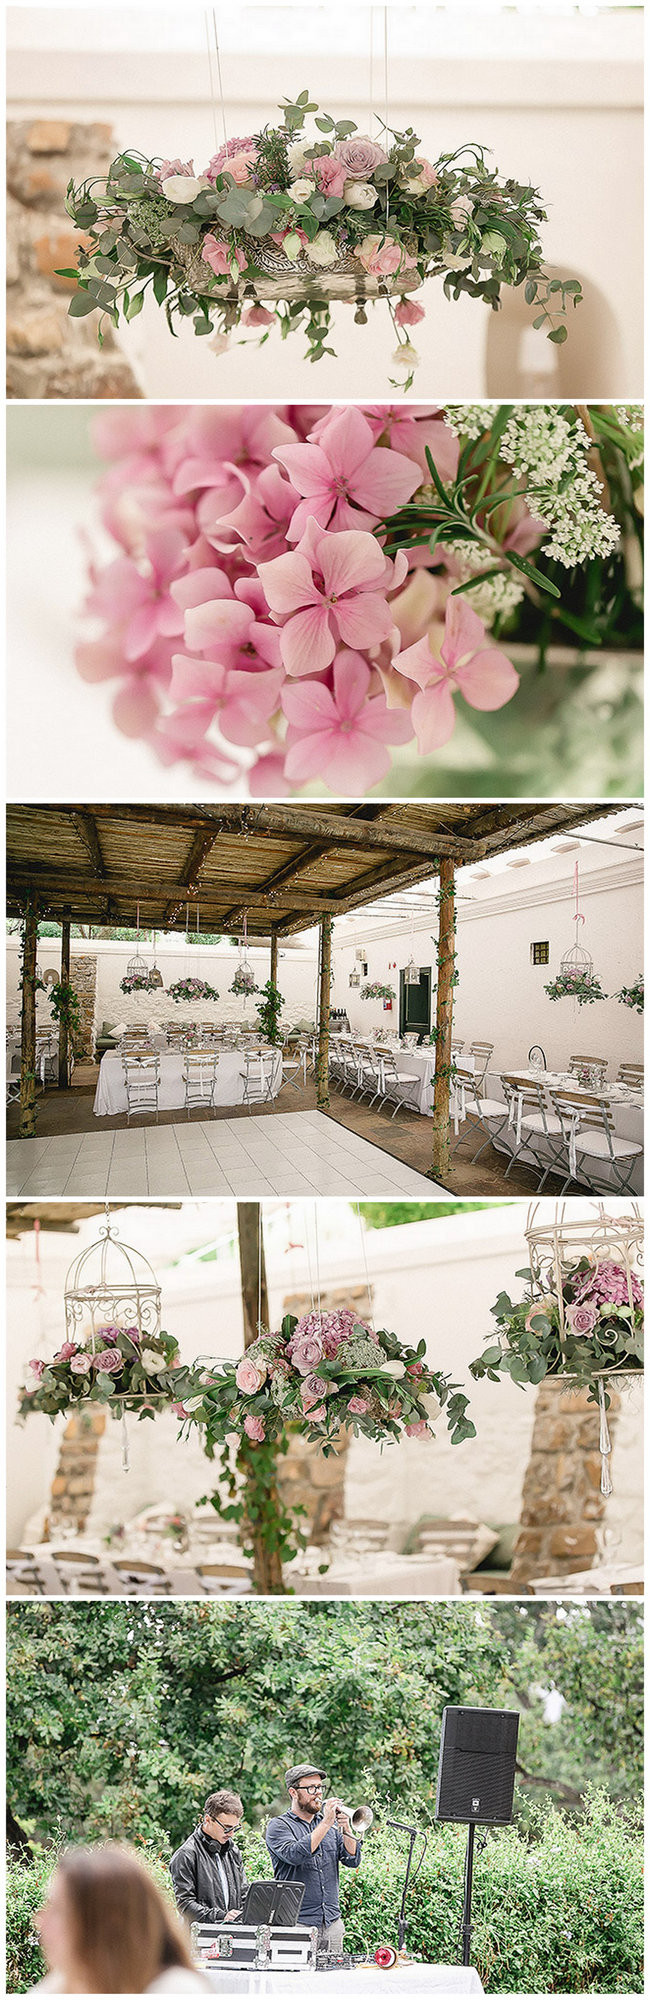 Romantic Courtyard Wedding